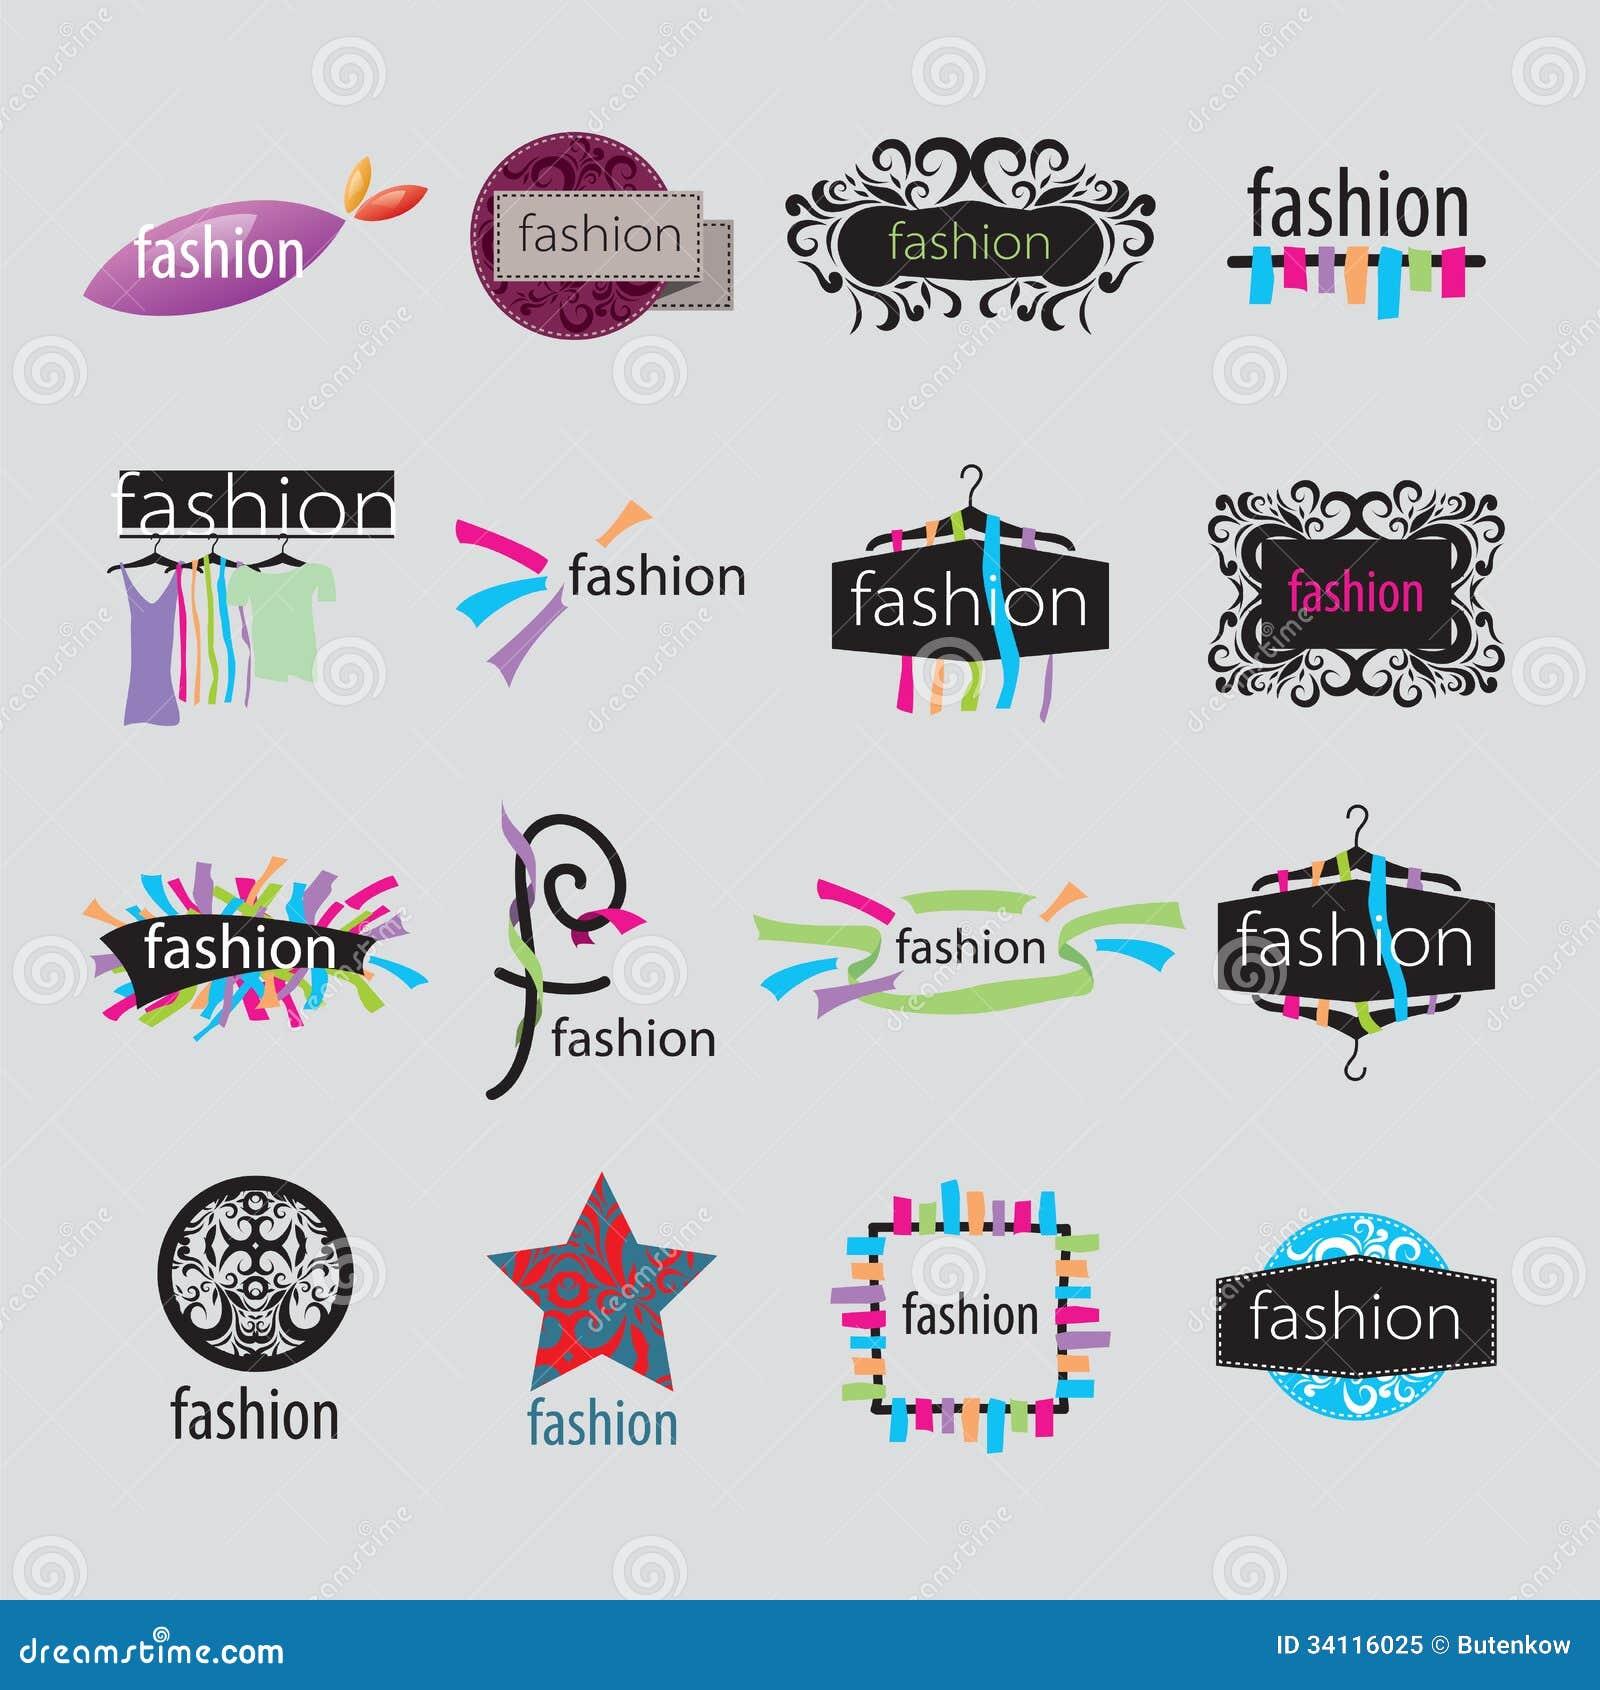 Vector Logos Fashion Accessories Stock Vector - Image ...